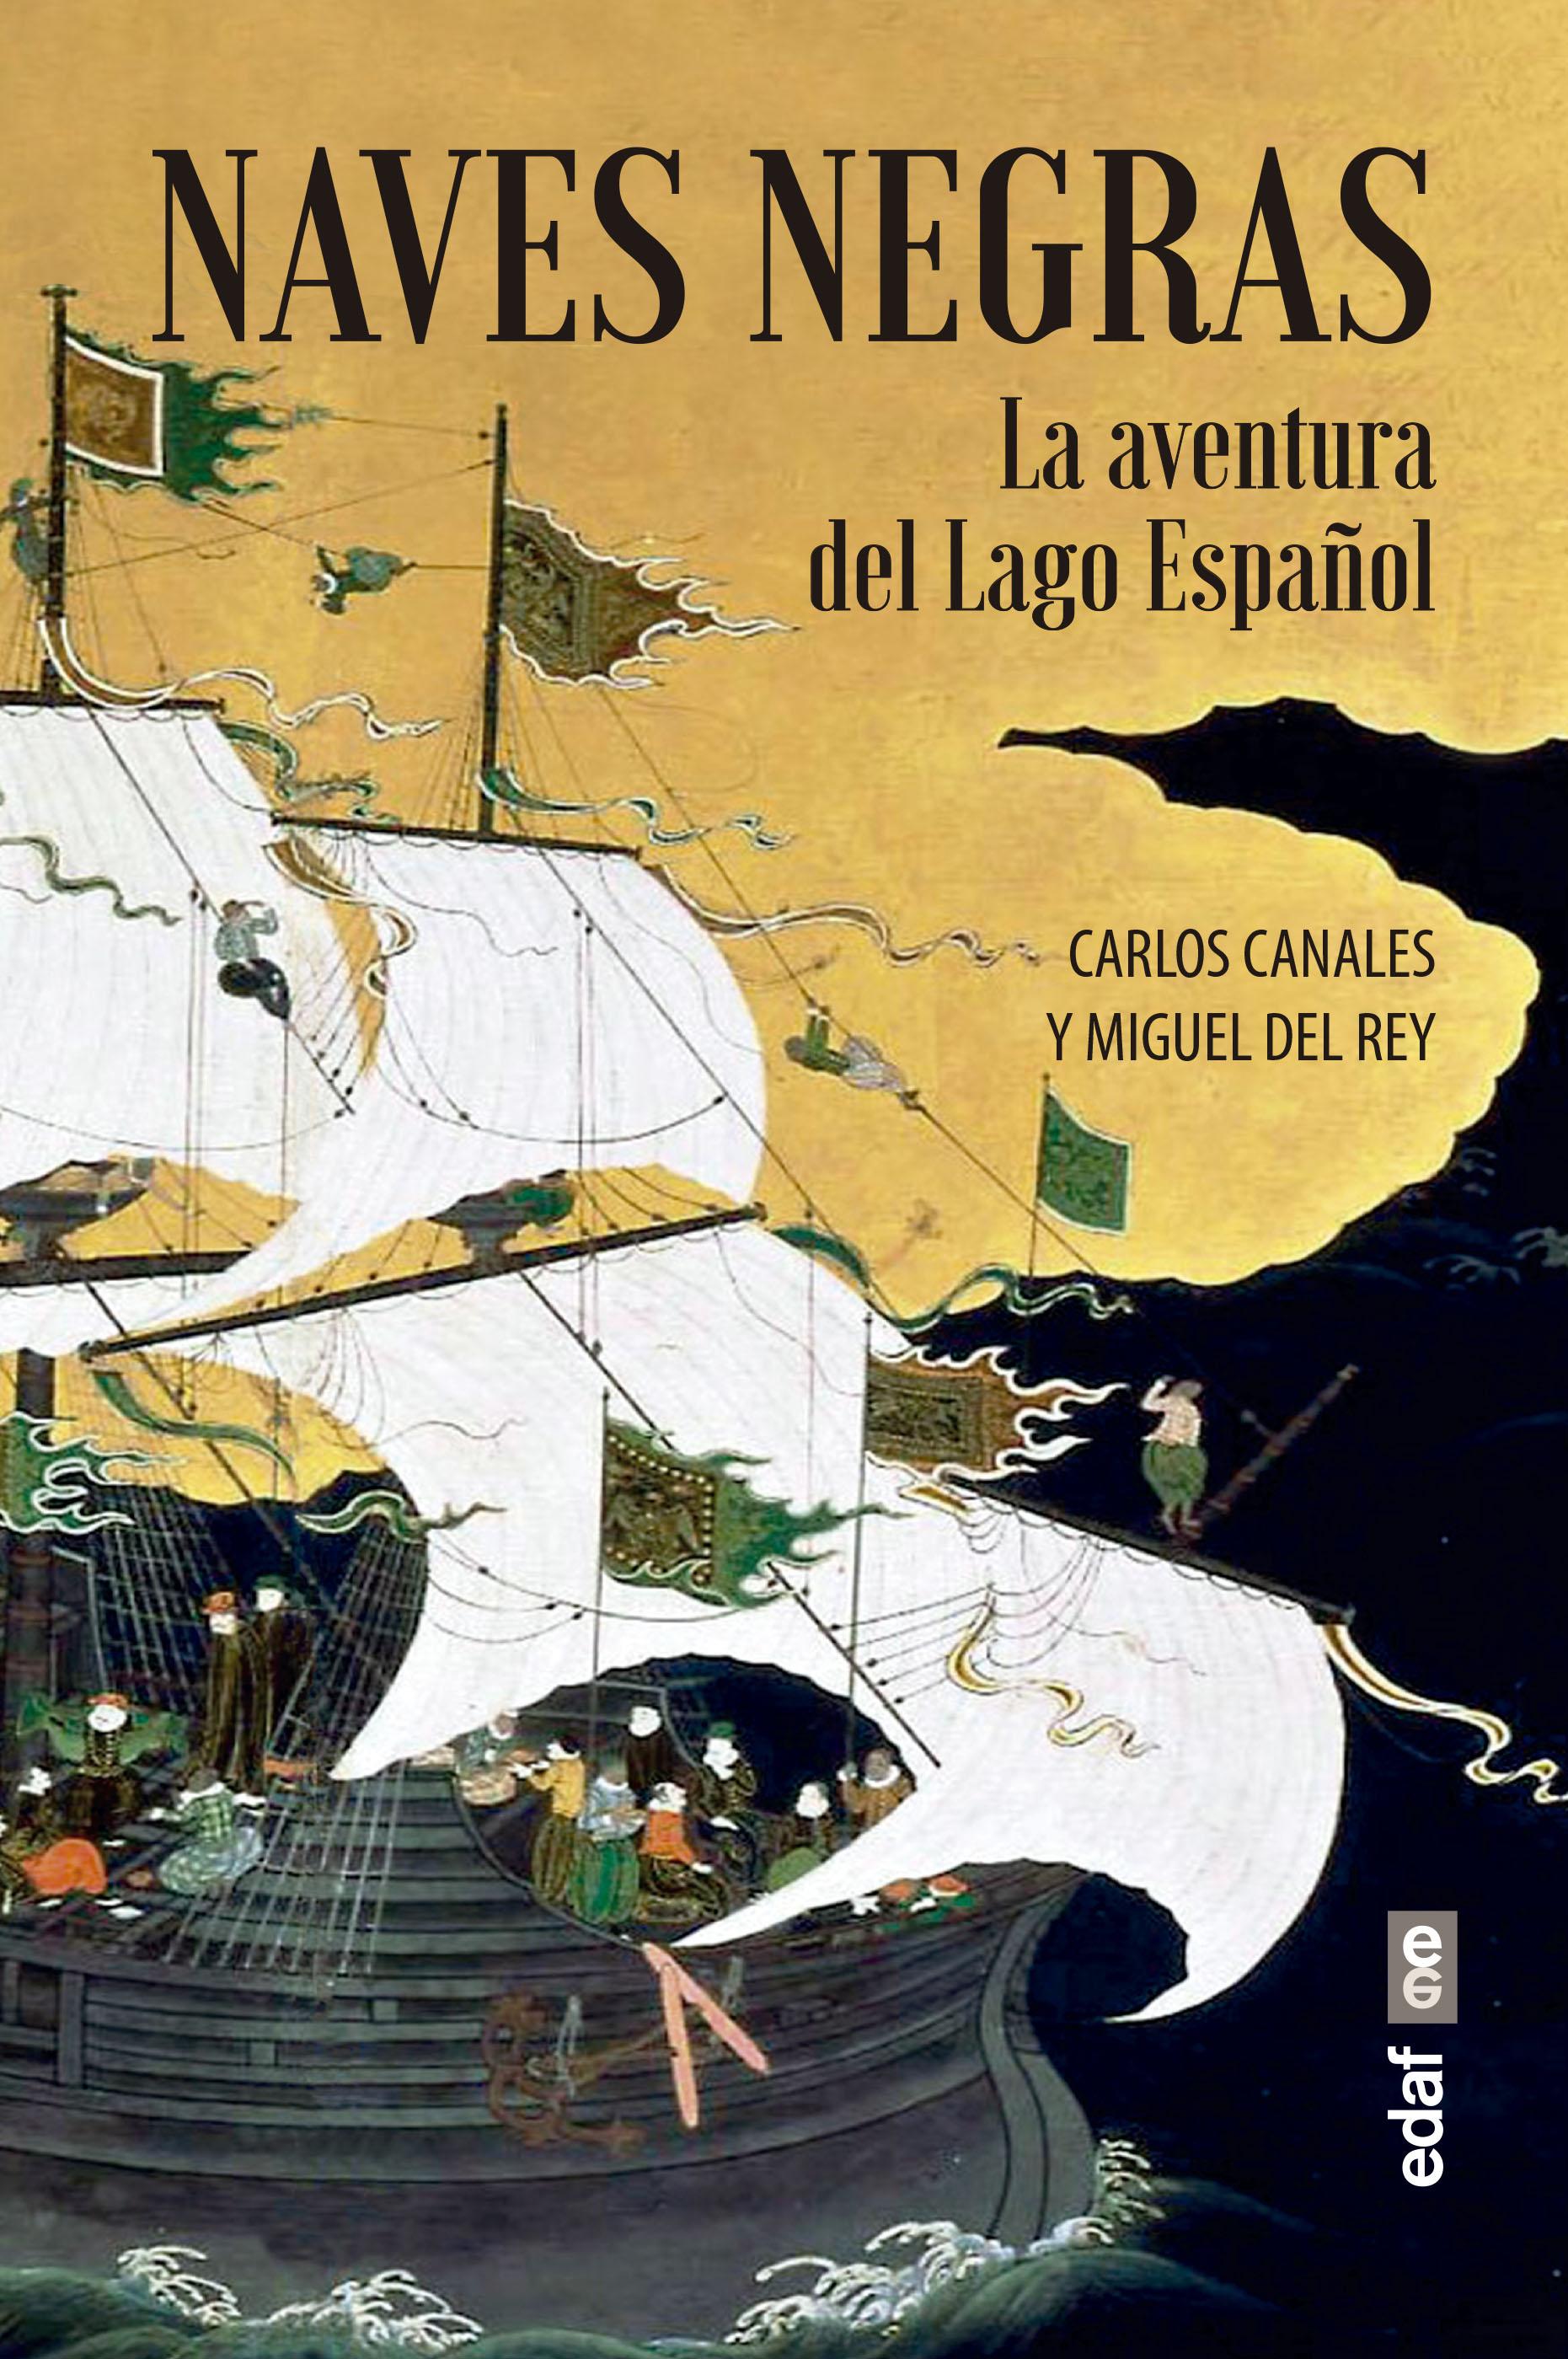 Naves negras   «La aventura del Lago Español»